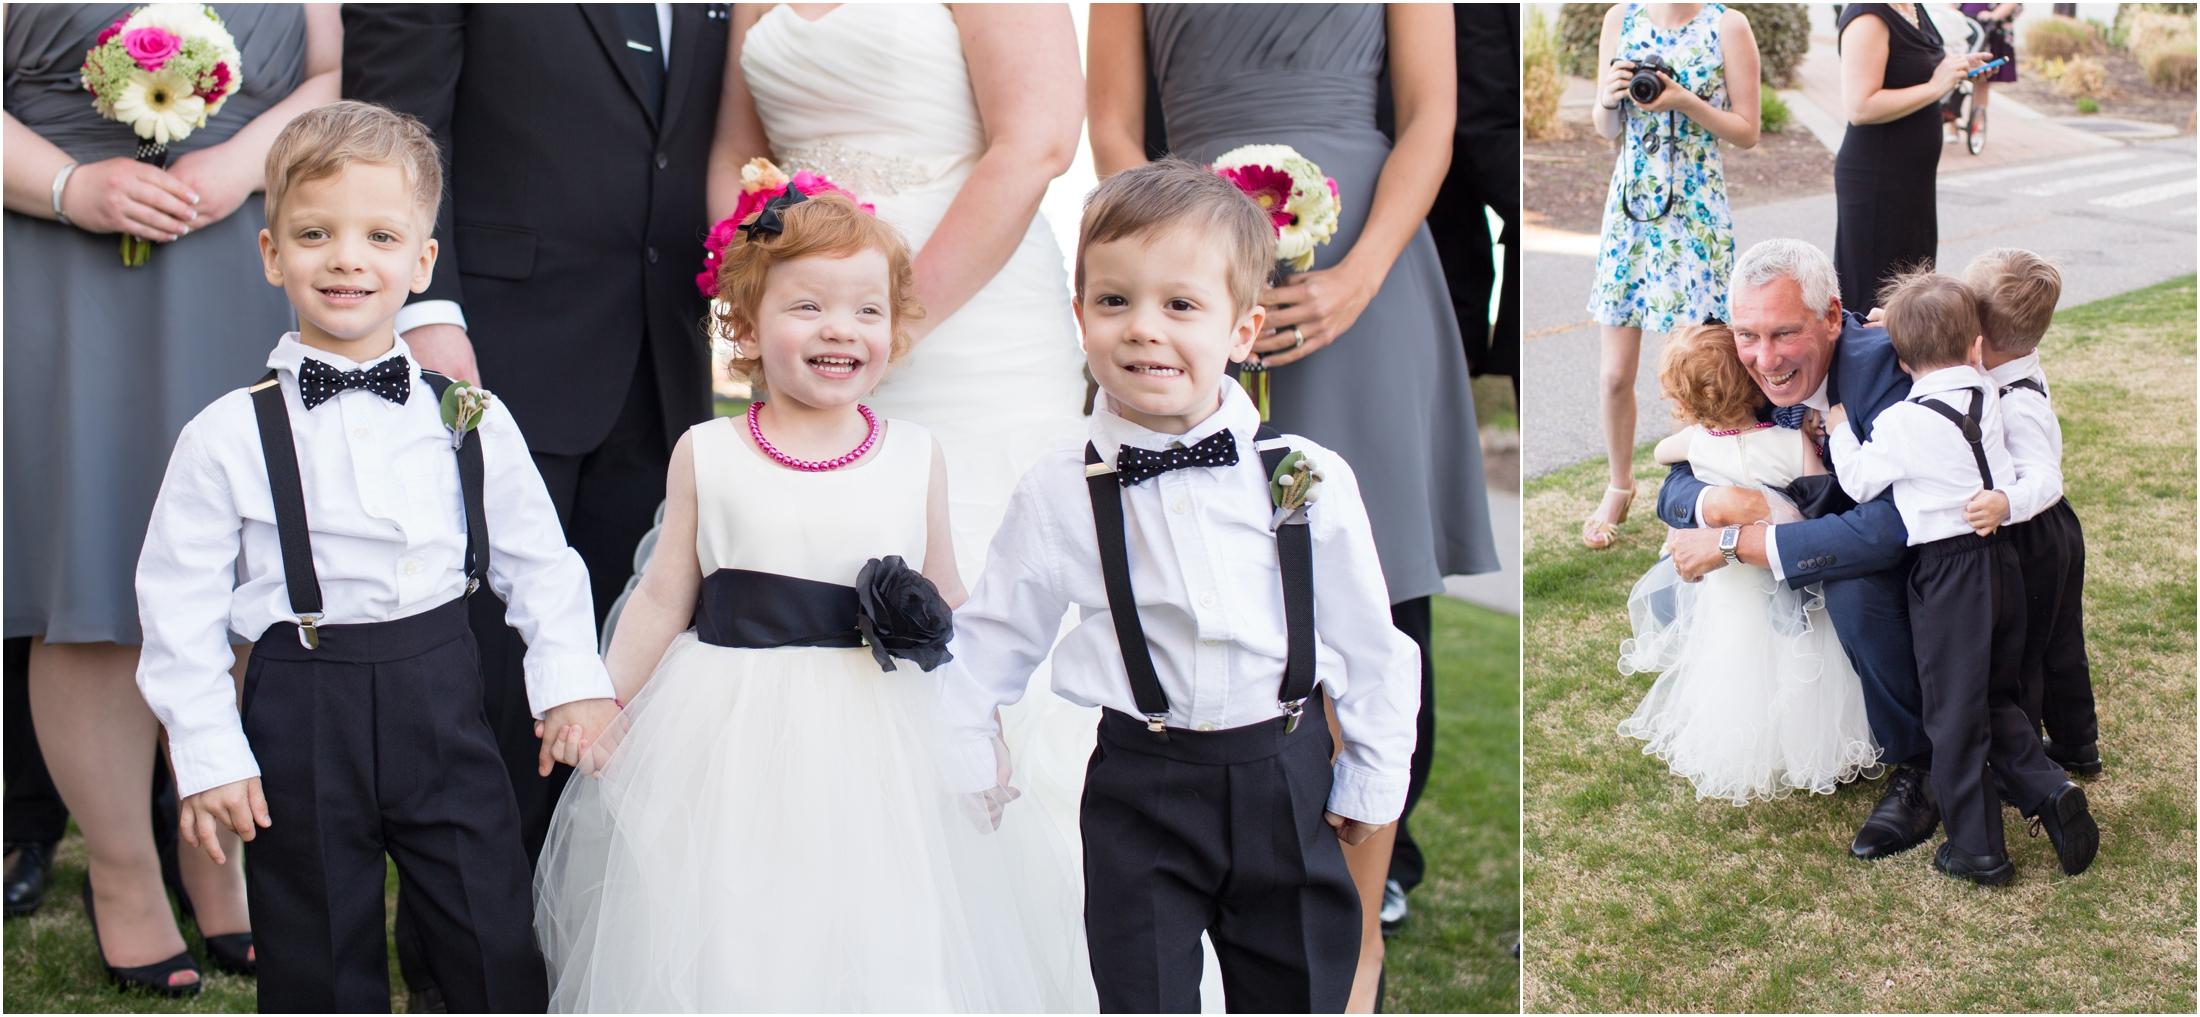 2-Lambert-Wedding-Bridal-Party-881.jpg